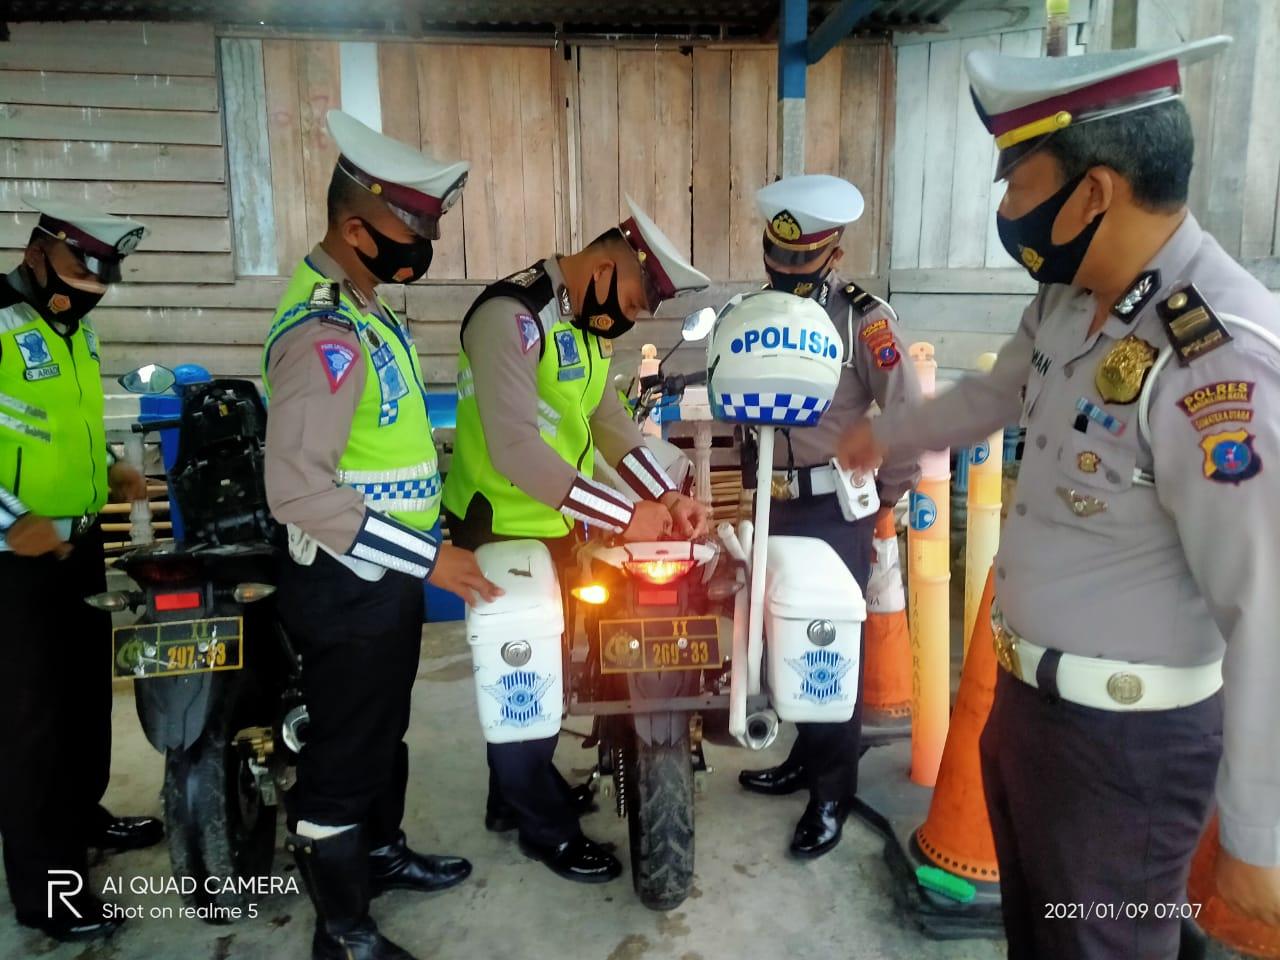 KBO Satlantas Polres Madina Cek dan Kontrol Ramor Dinas Roda Dua